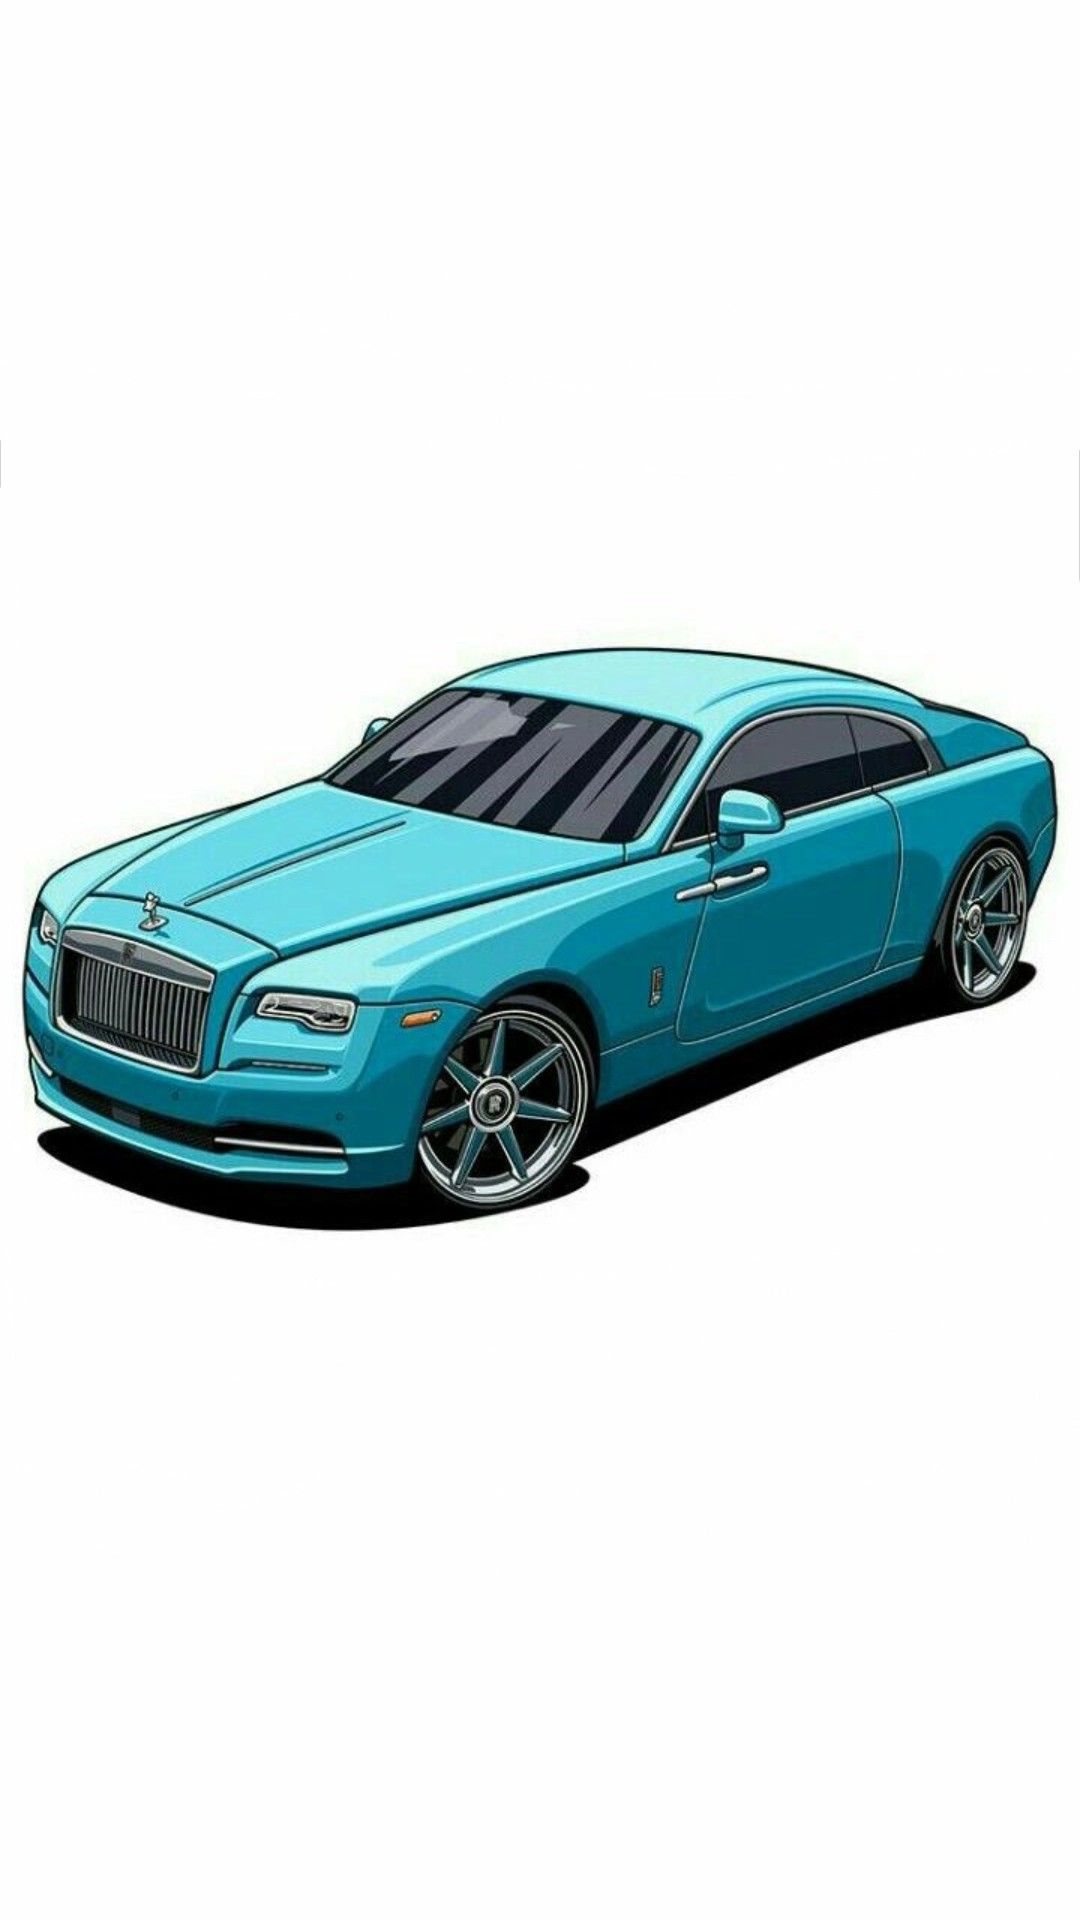 Roles Royce Car Cartoon Luxury Cars Car Posters